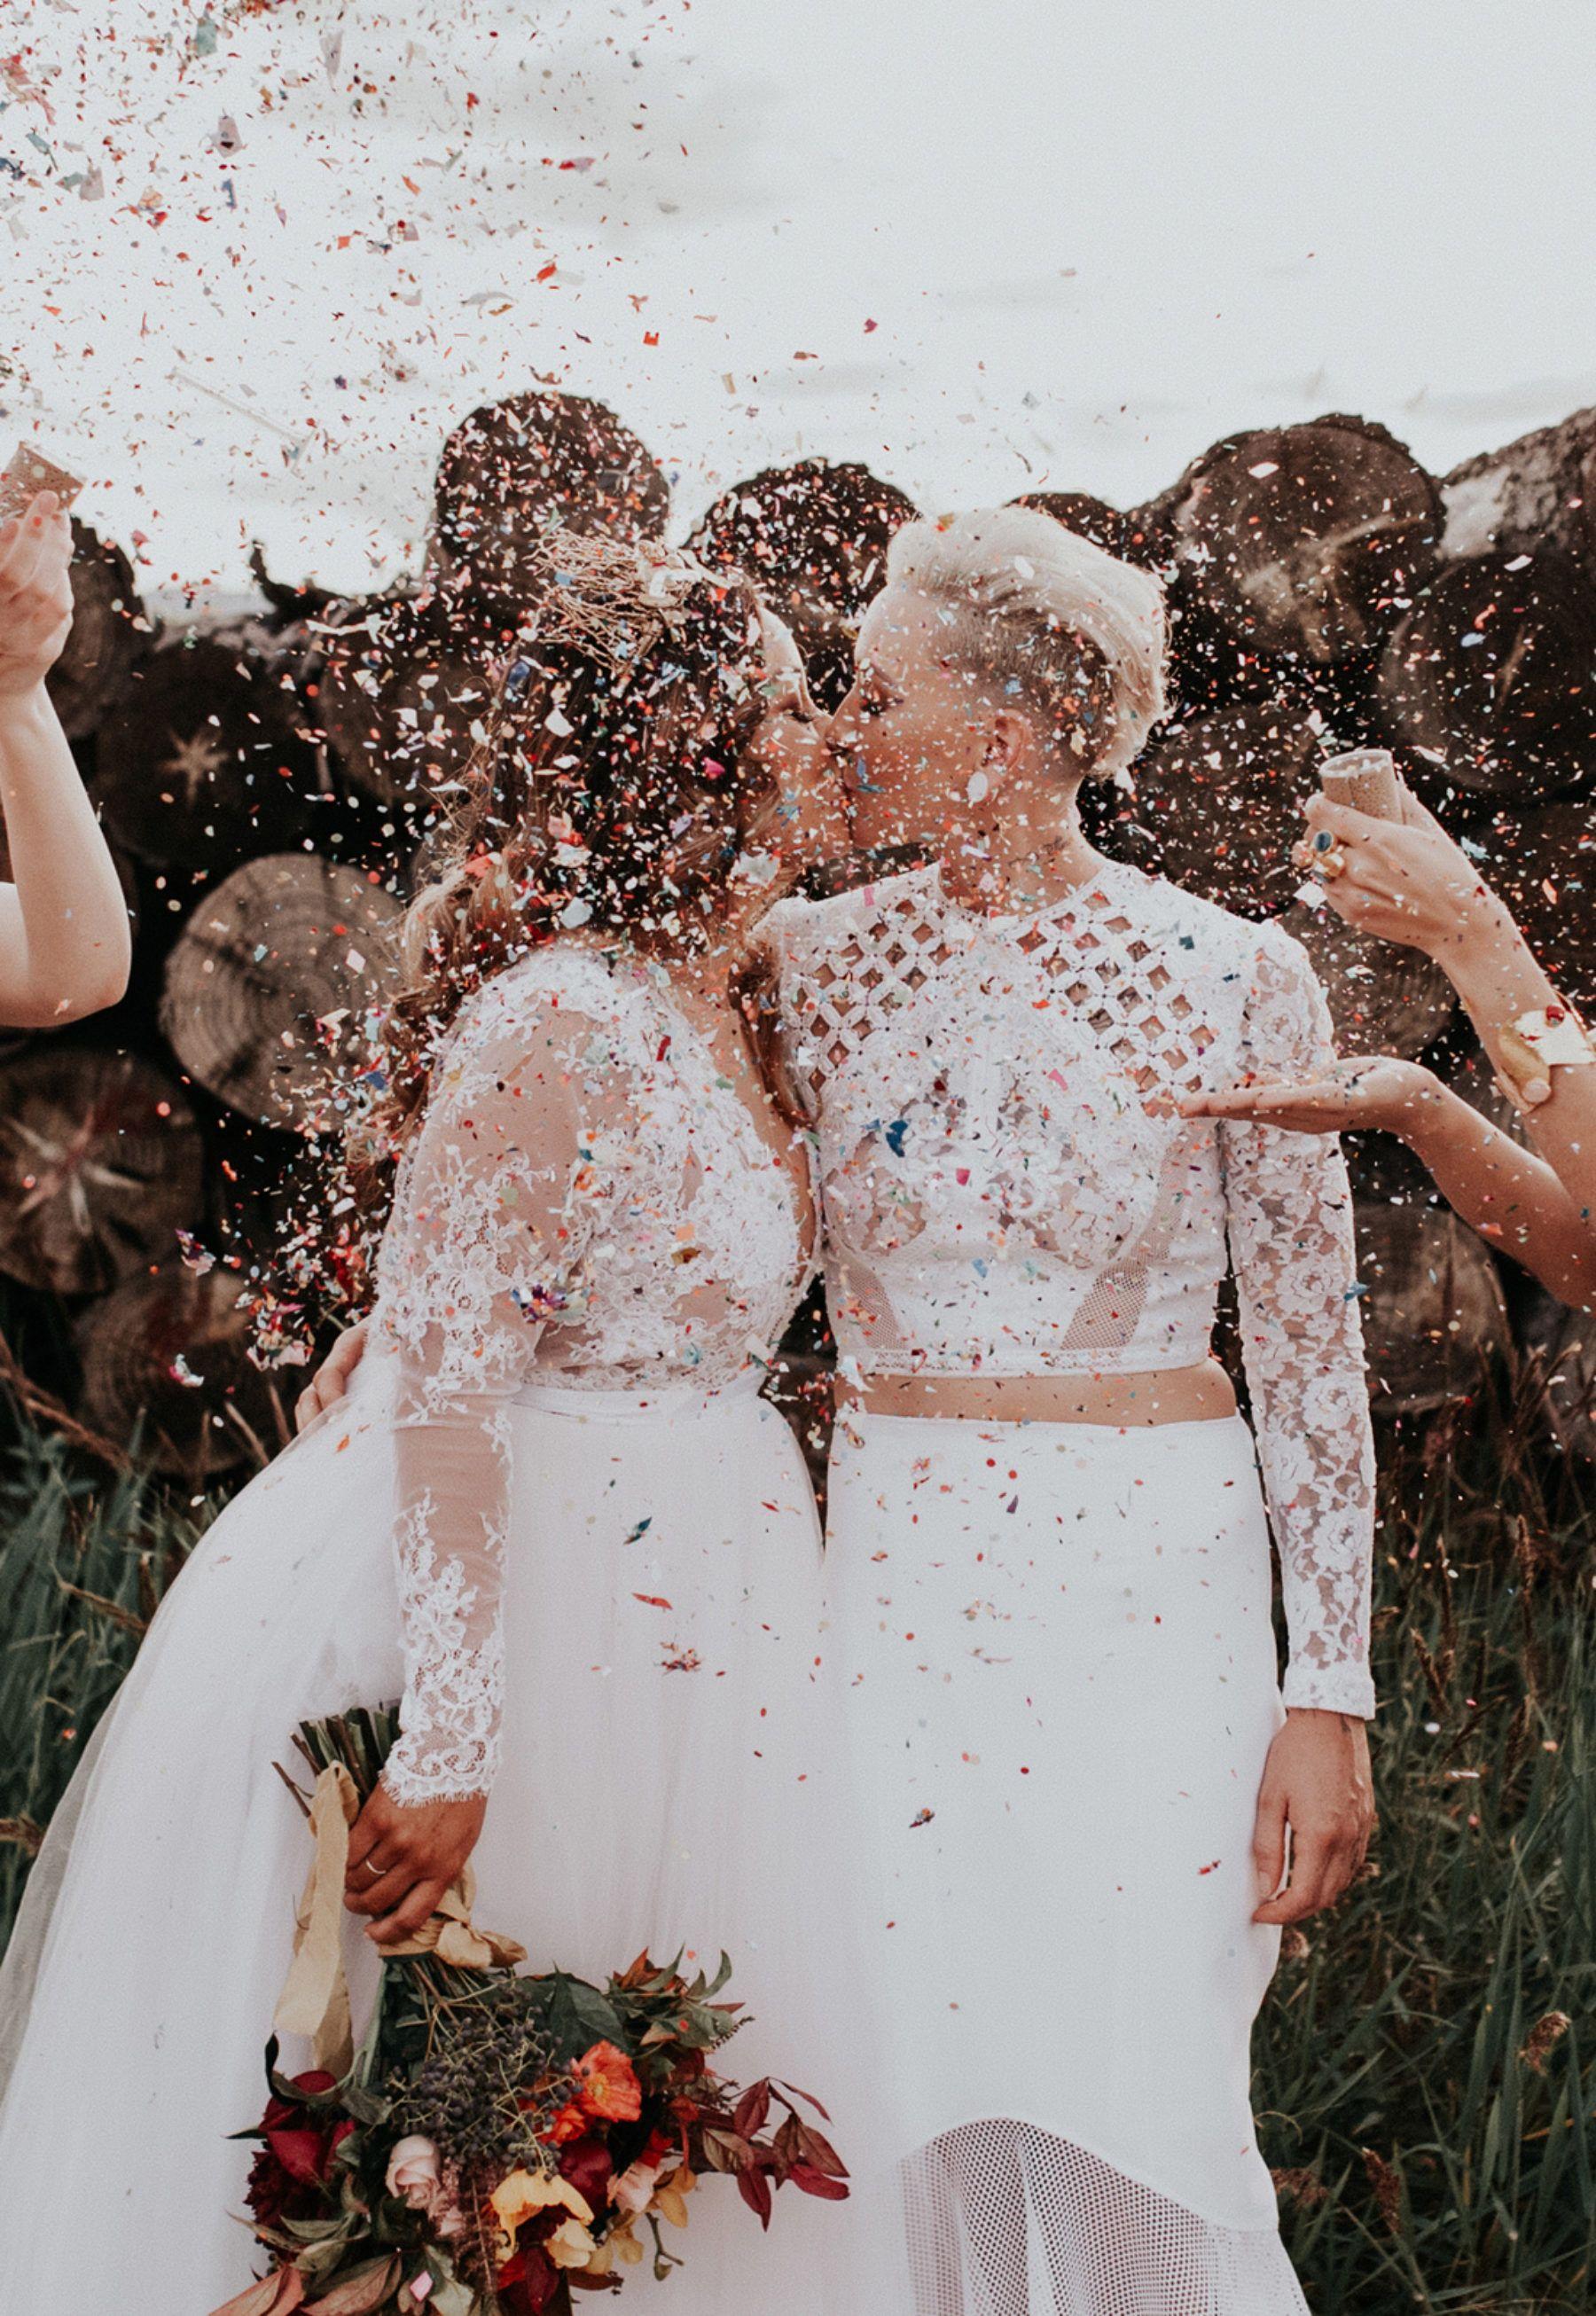 brides kissing in confetti shower | here comes the bride | Pinterest ...